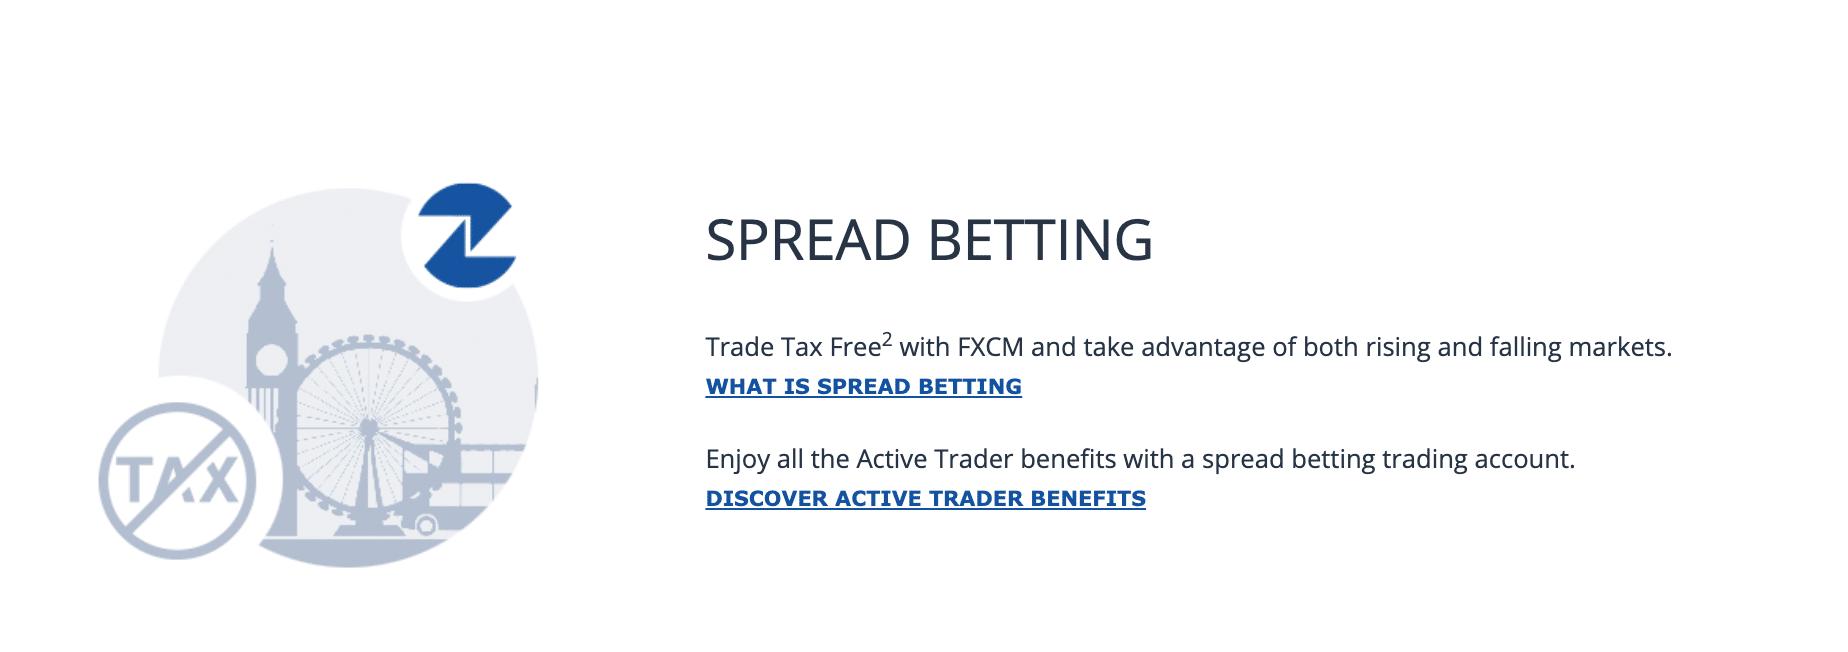 fxcm spread betting